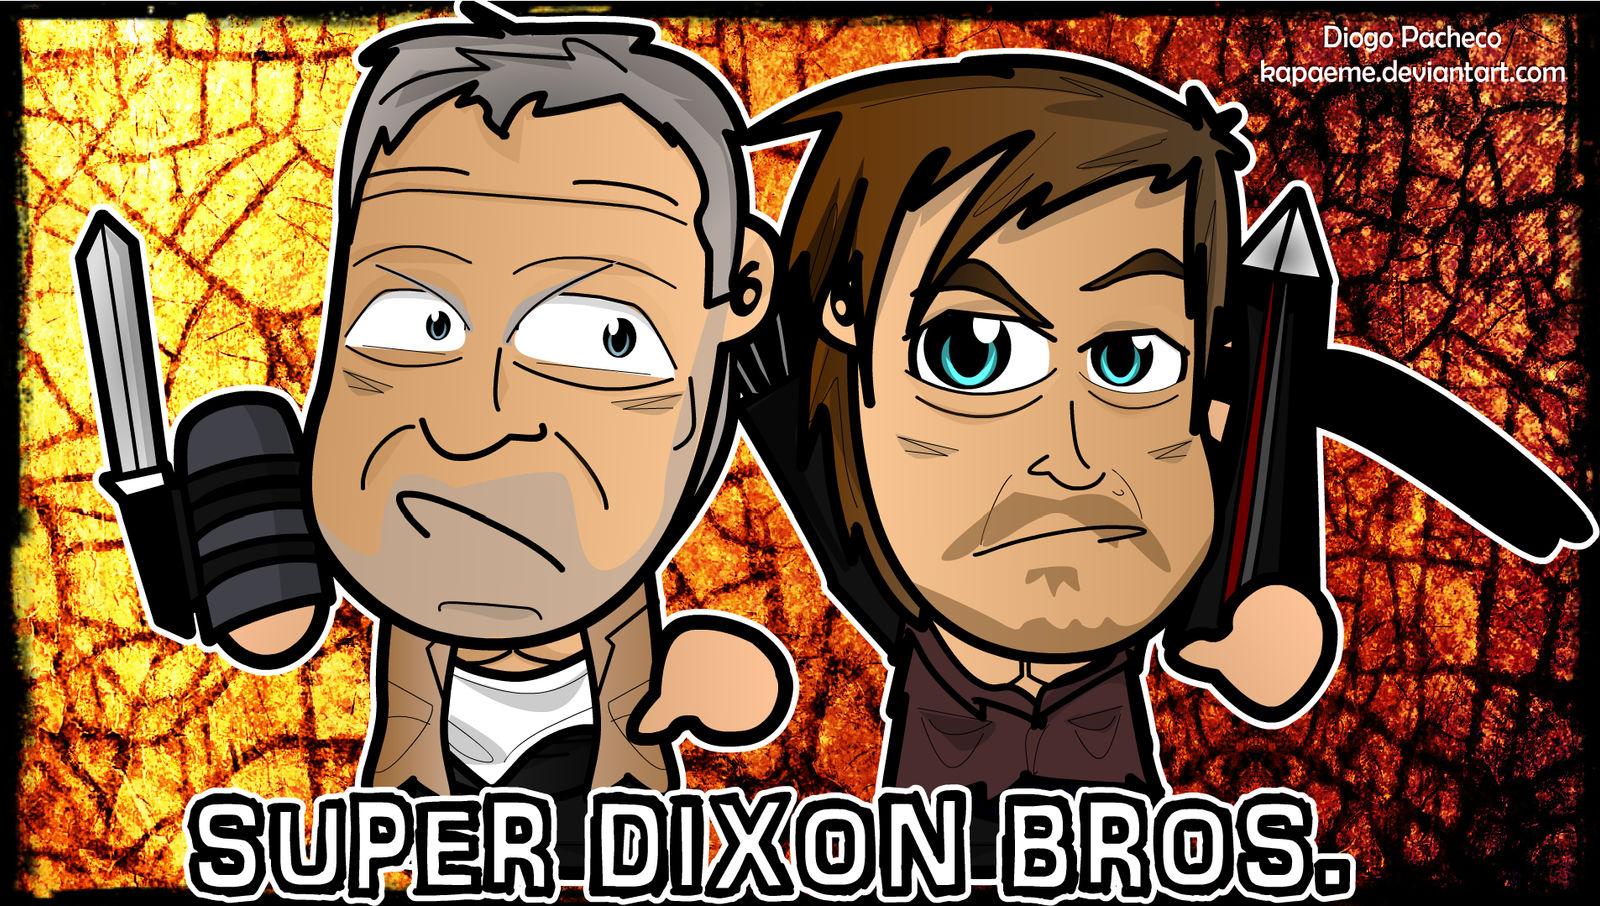 Super Dixon Bros The Walking Dead Wallpaper By Kapaeme On